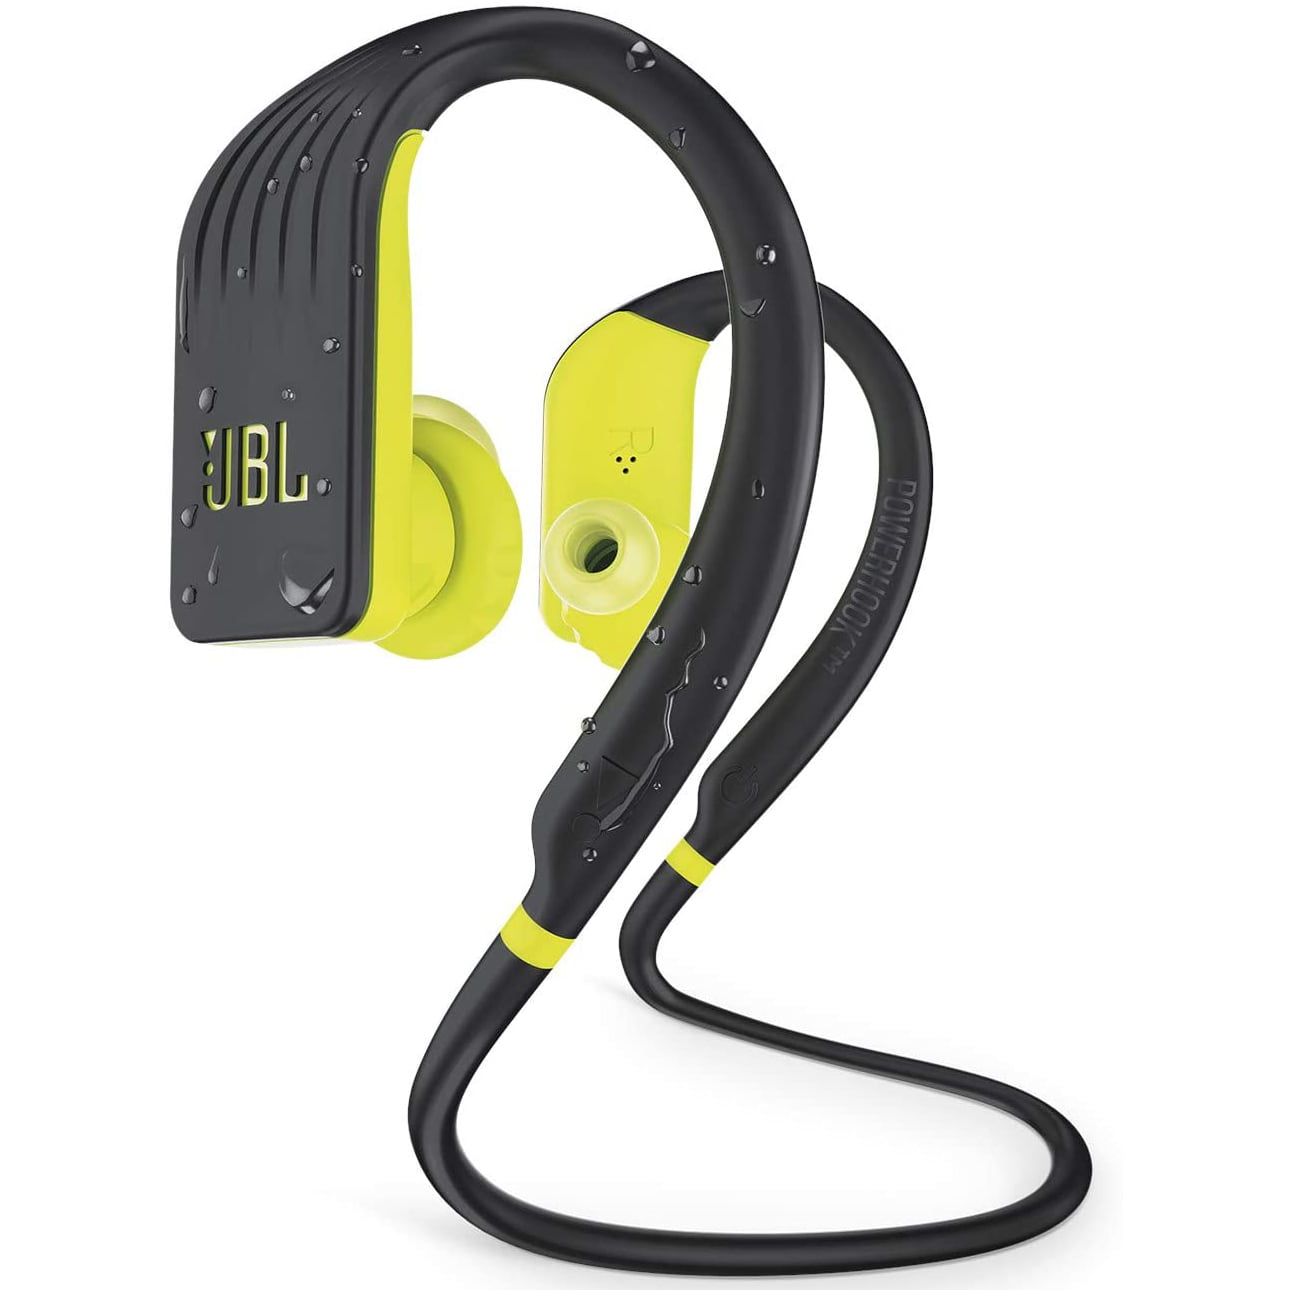 Casti In-Ear JBL Endurance Jump, Wireless, Bluetooth, Autonomie 8 ore, IPX7, Yellow